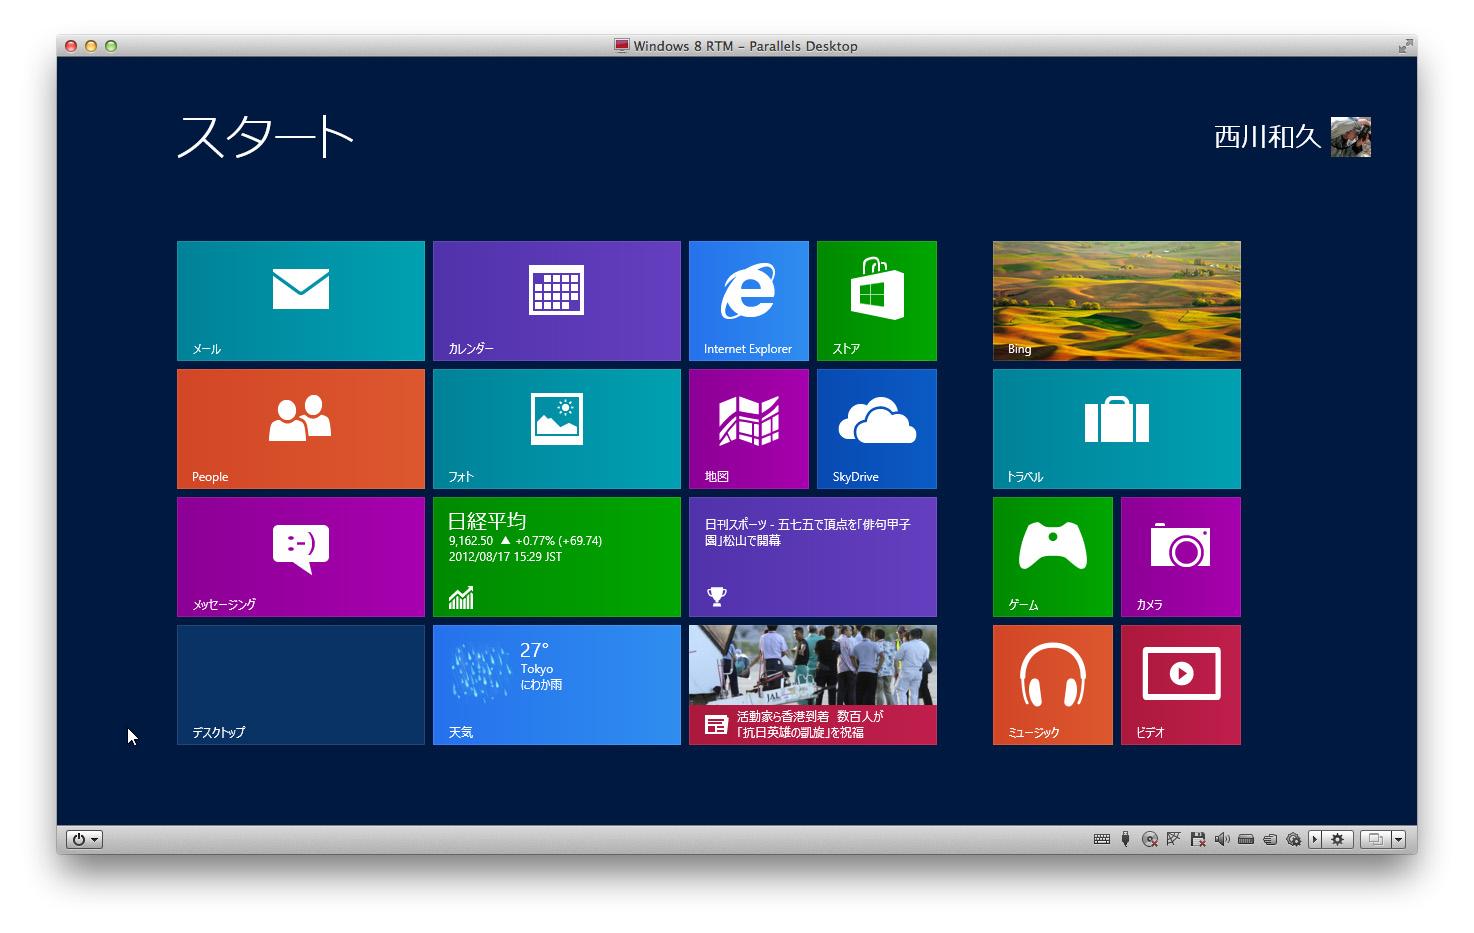 Windows 8 Enterprise RTM